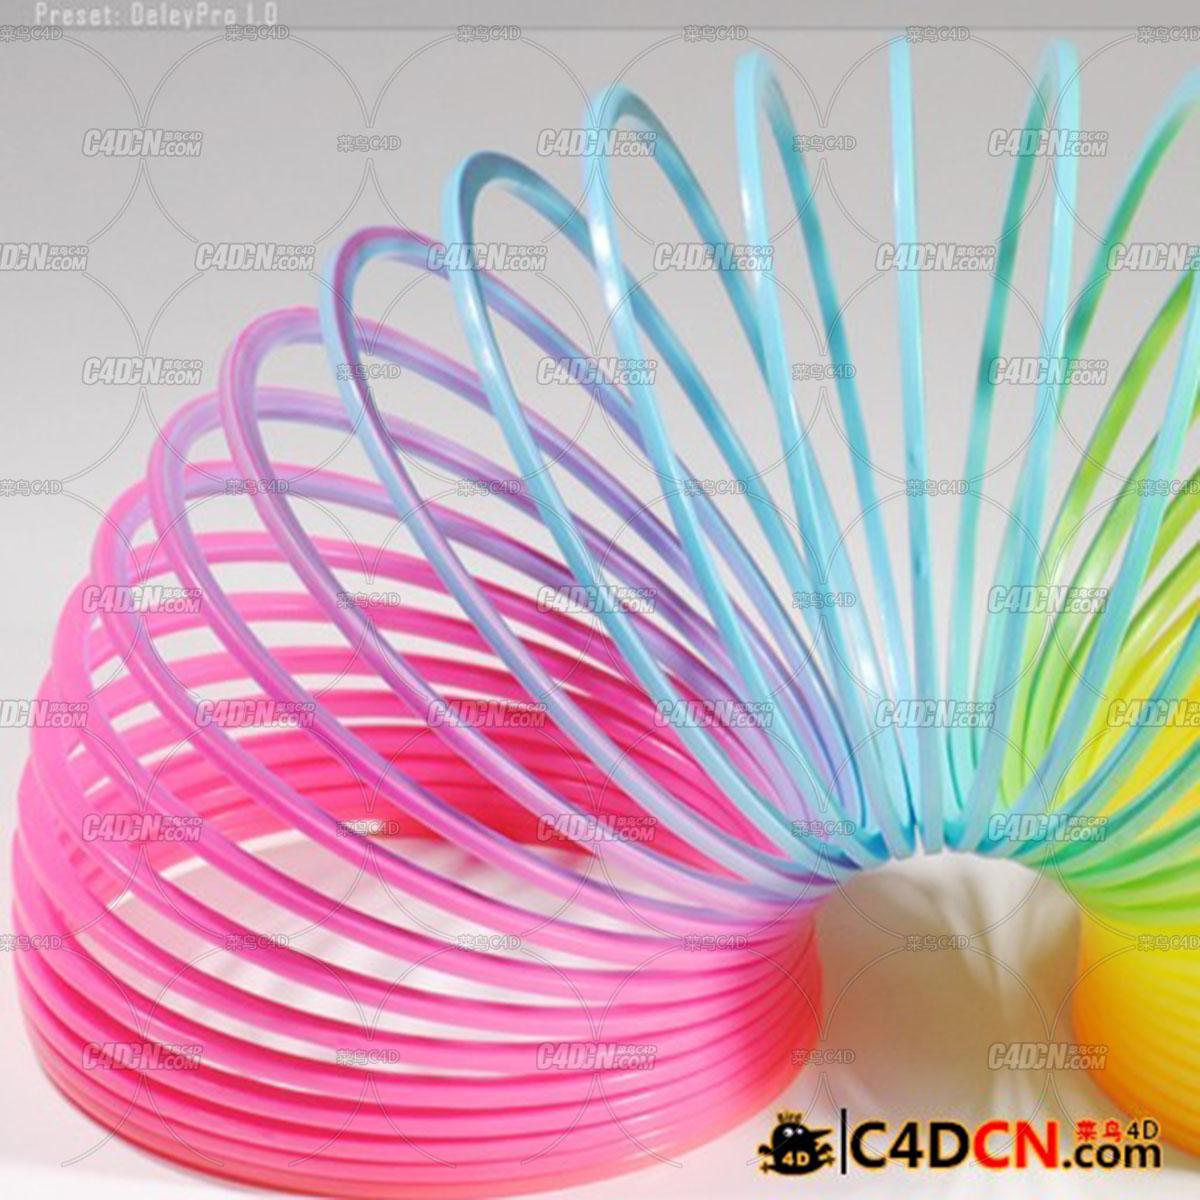 C4D延遲效果腳本預設專業漢化版XPS DelayPro